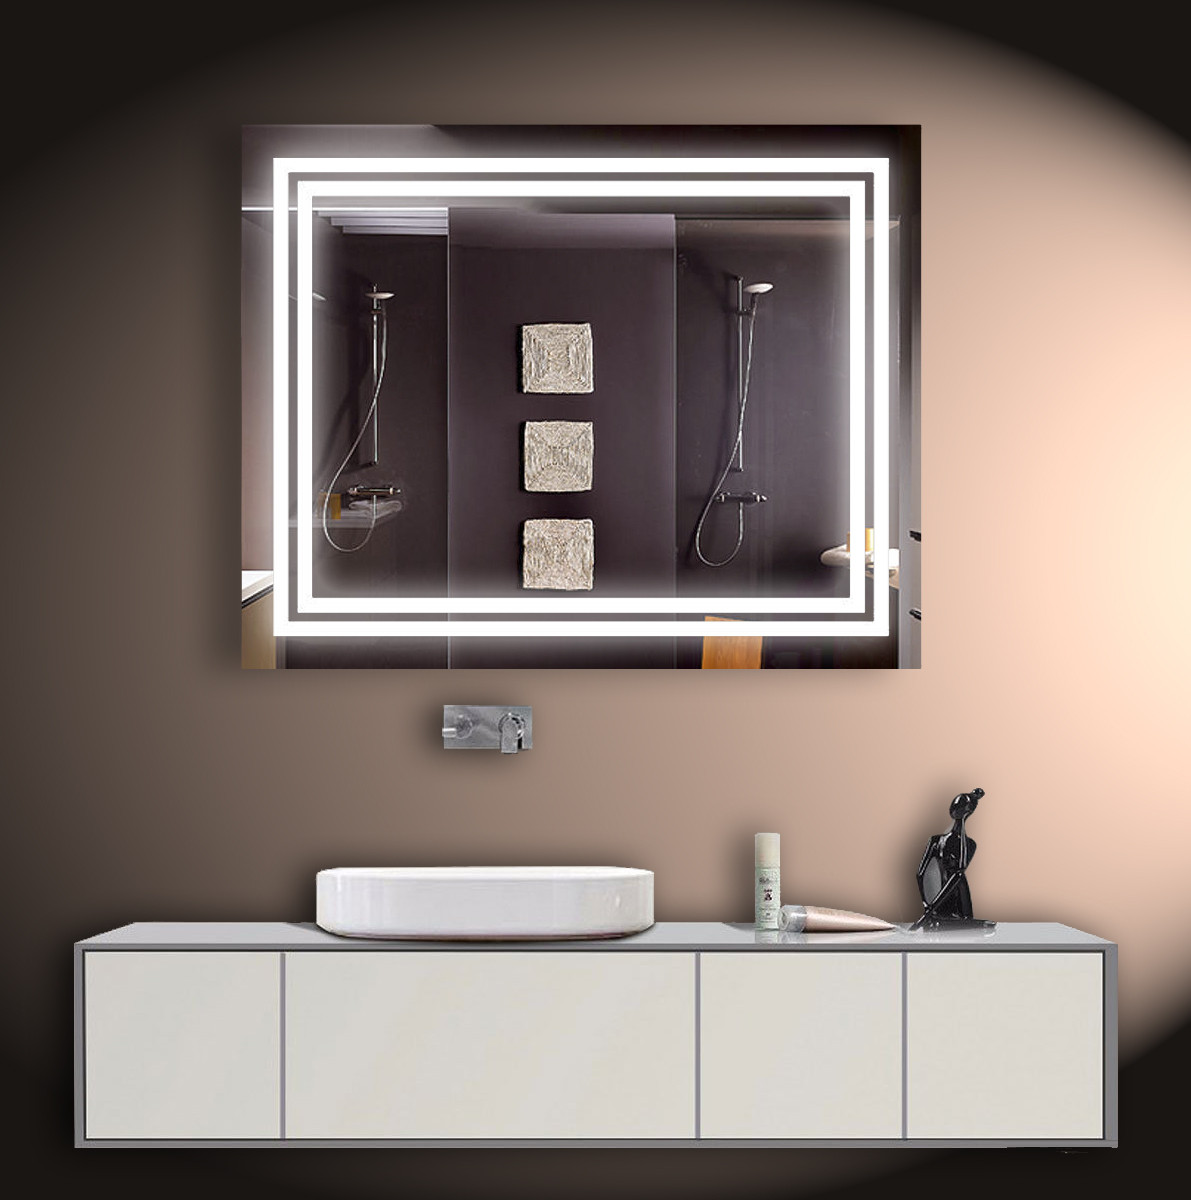 Зеркало LED со светодиодной подсветкой ver-3081 1000х800 мм